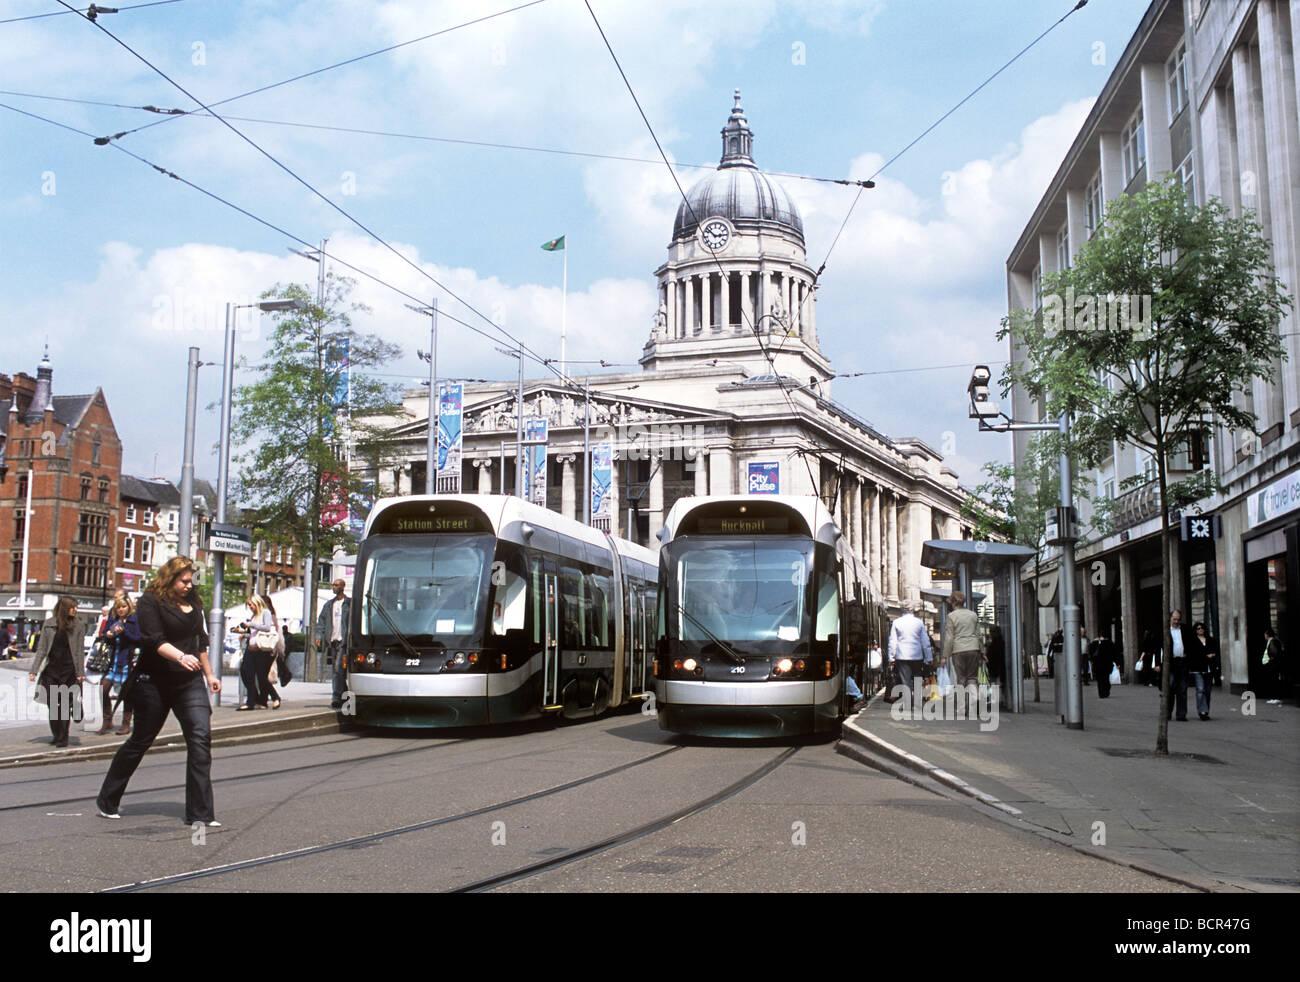 House Charging Station Old Market Square Tram Stop Nottingham City Centre Stock